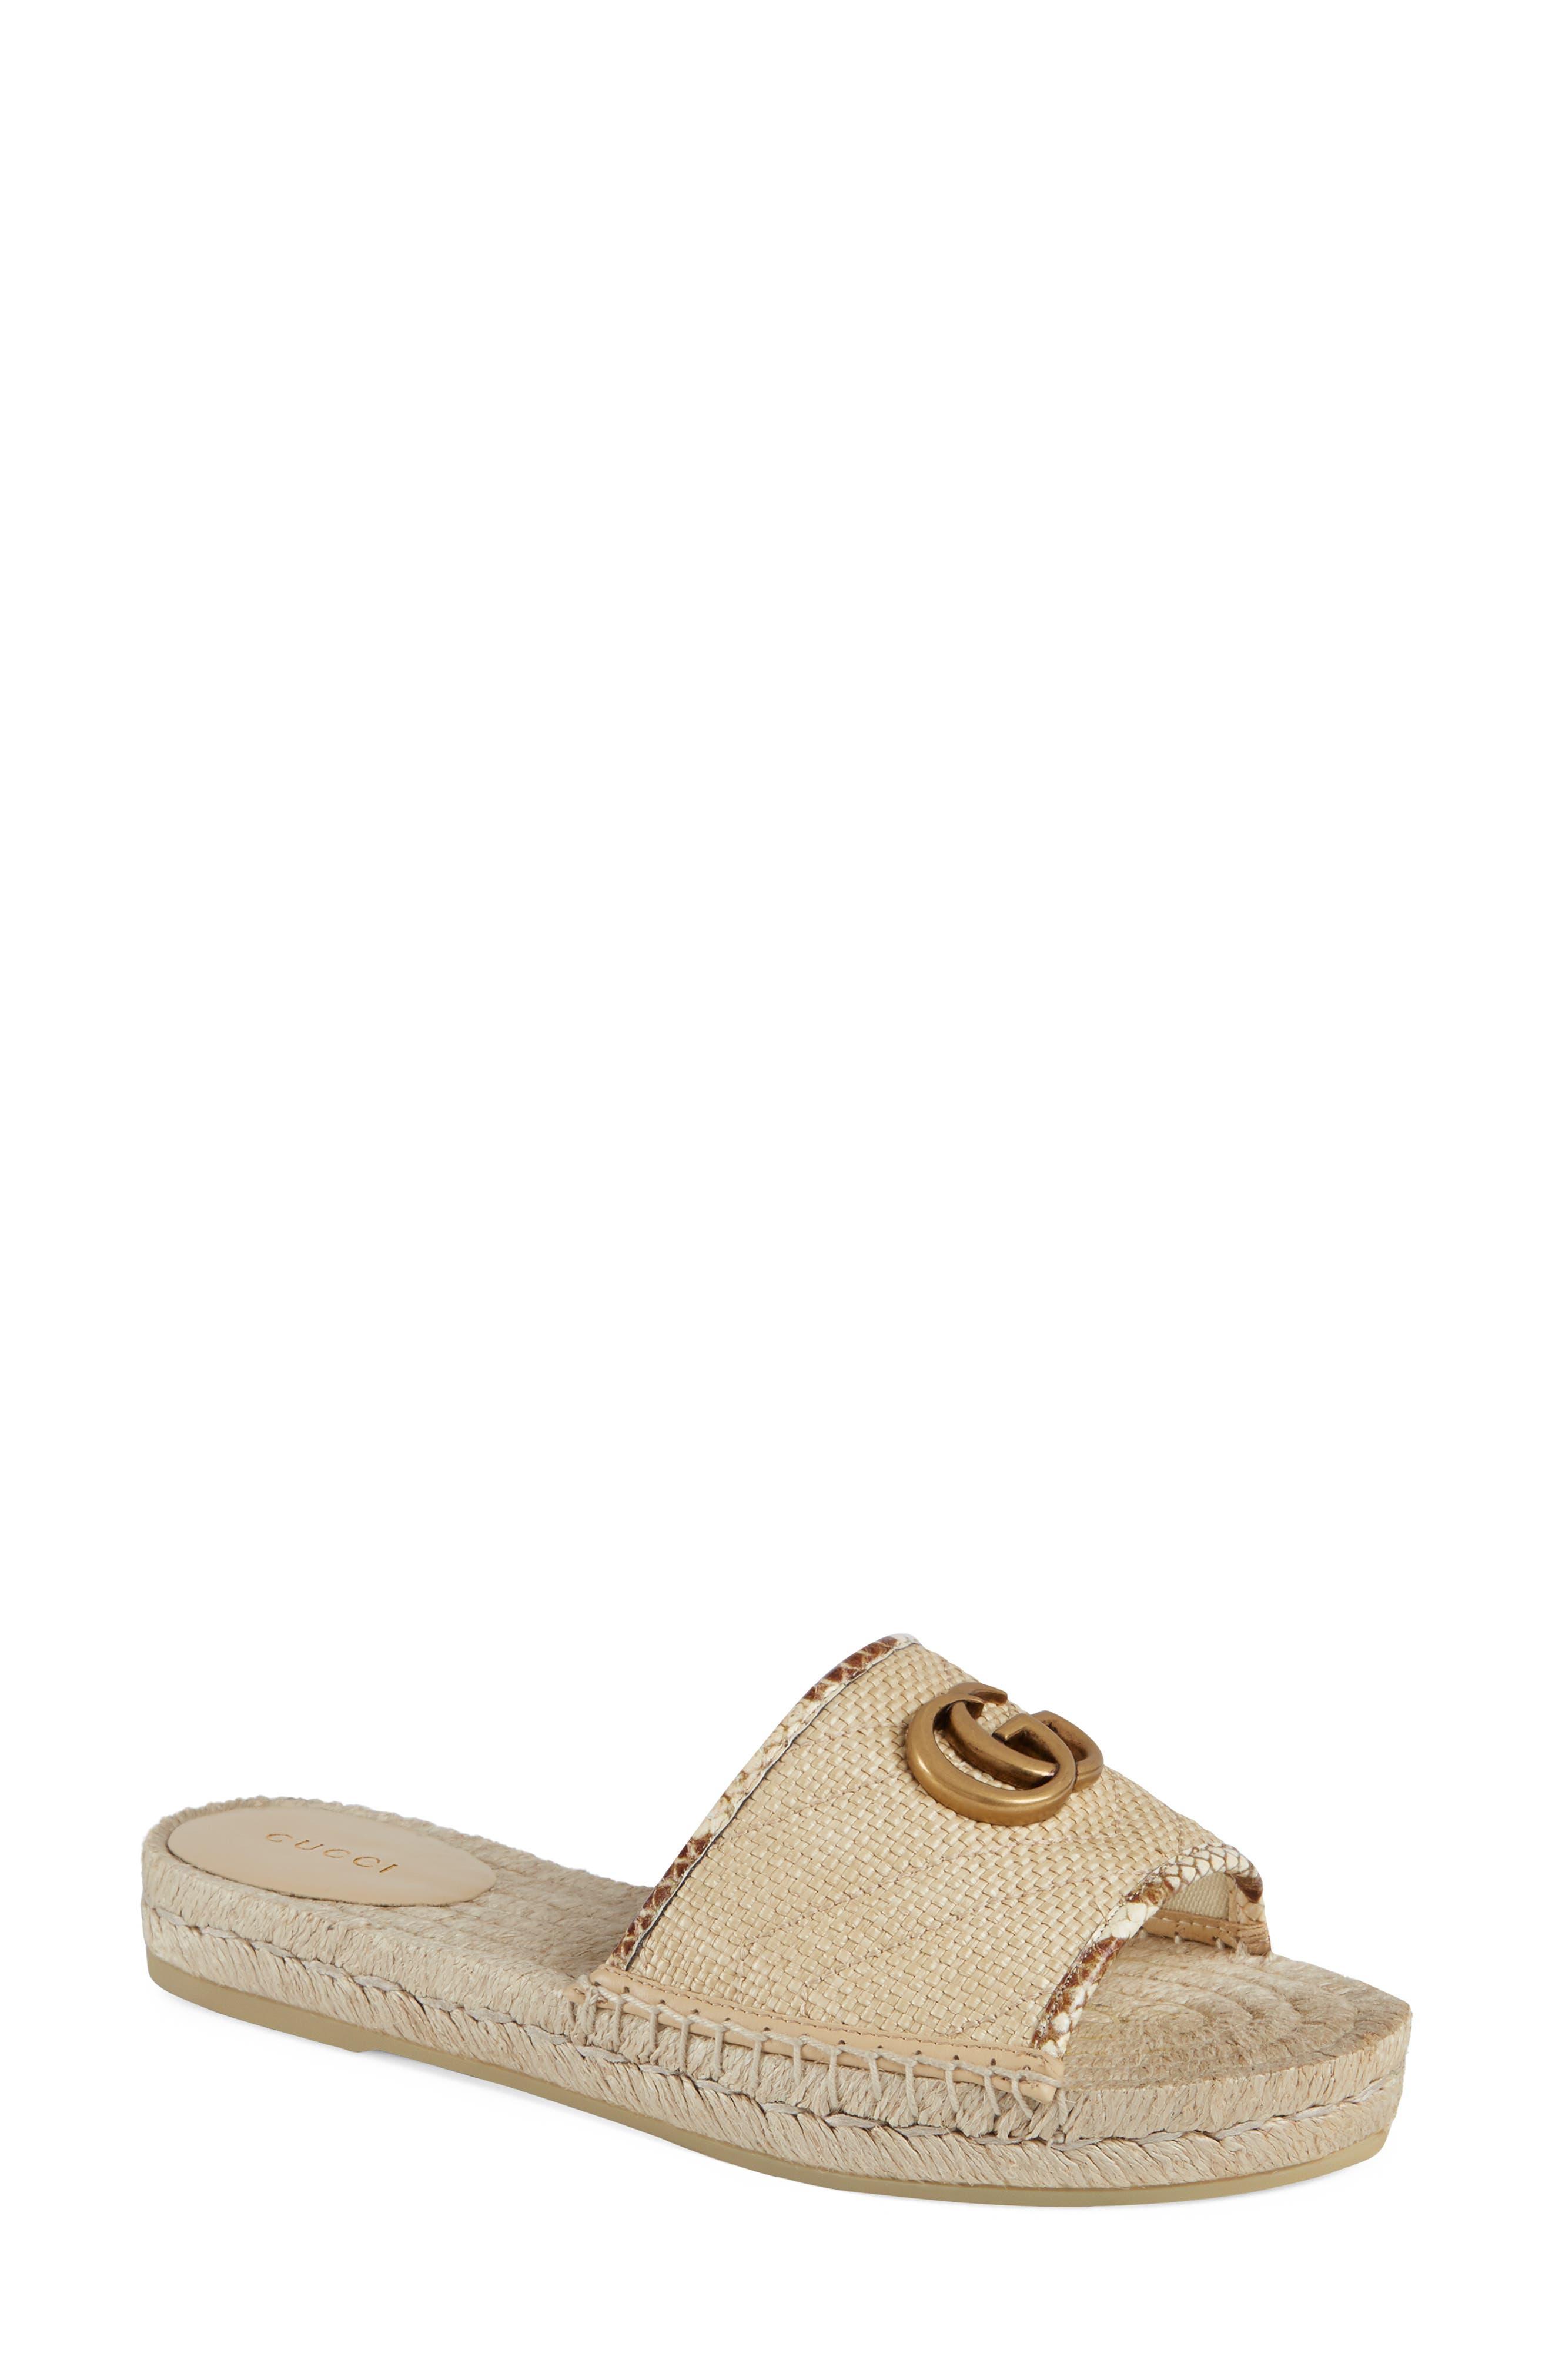 Gucci Pilar Espadrille Slide Sandal (Women)